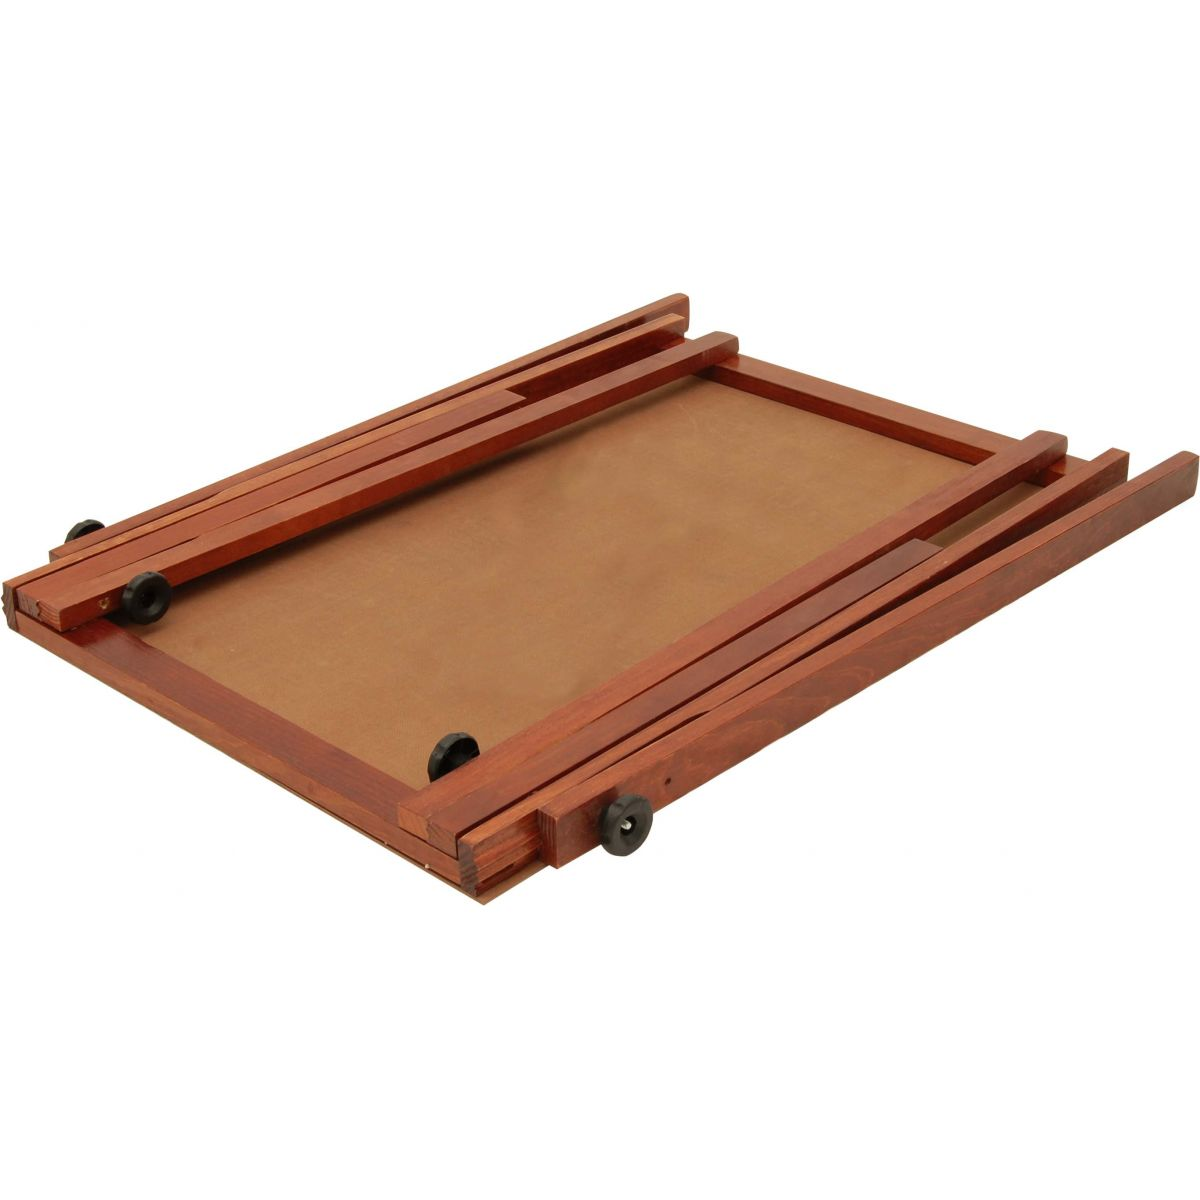 Cavalete Flip Chart Porta Bloco Compacto Quadro Branco Estrutura Cor Mogno c/ Suporte Para Canetas 2515 Souza